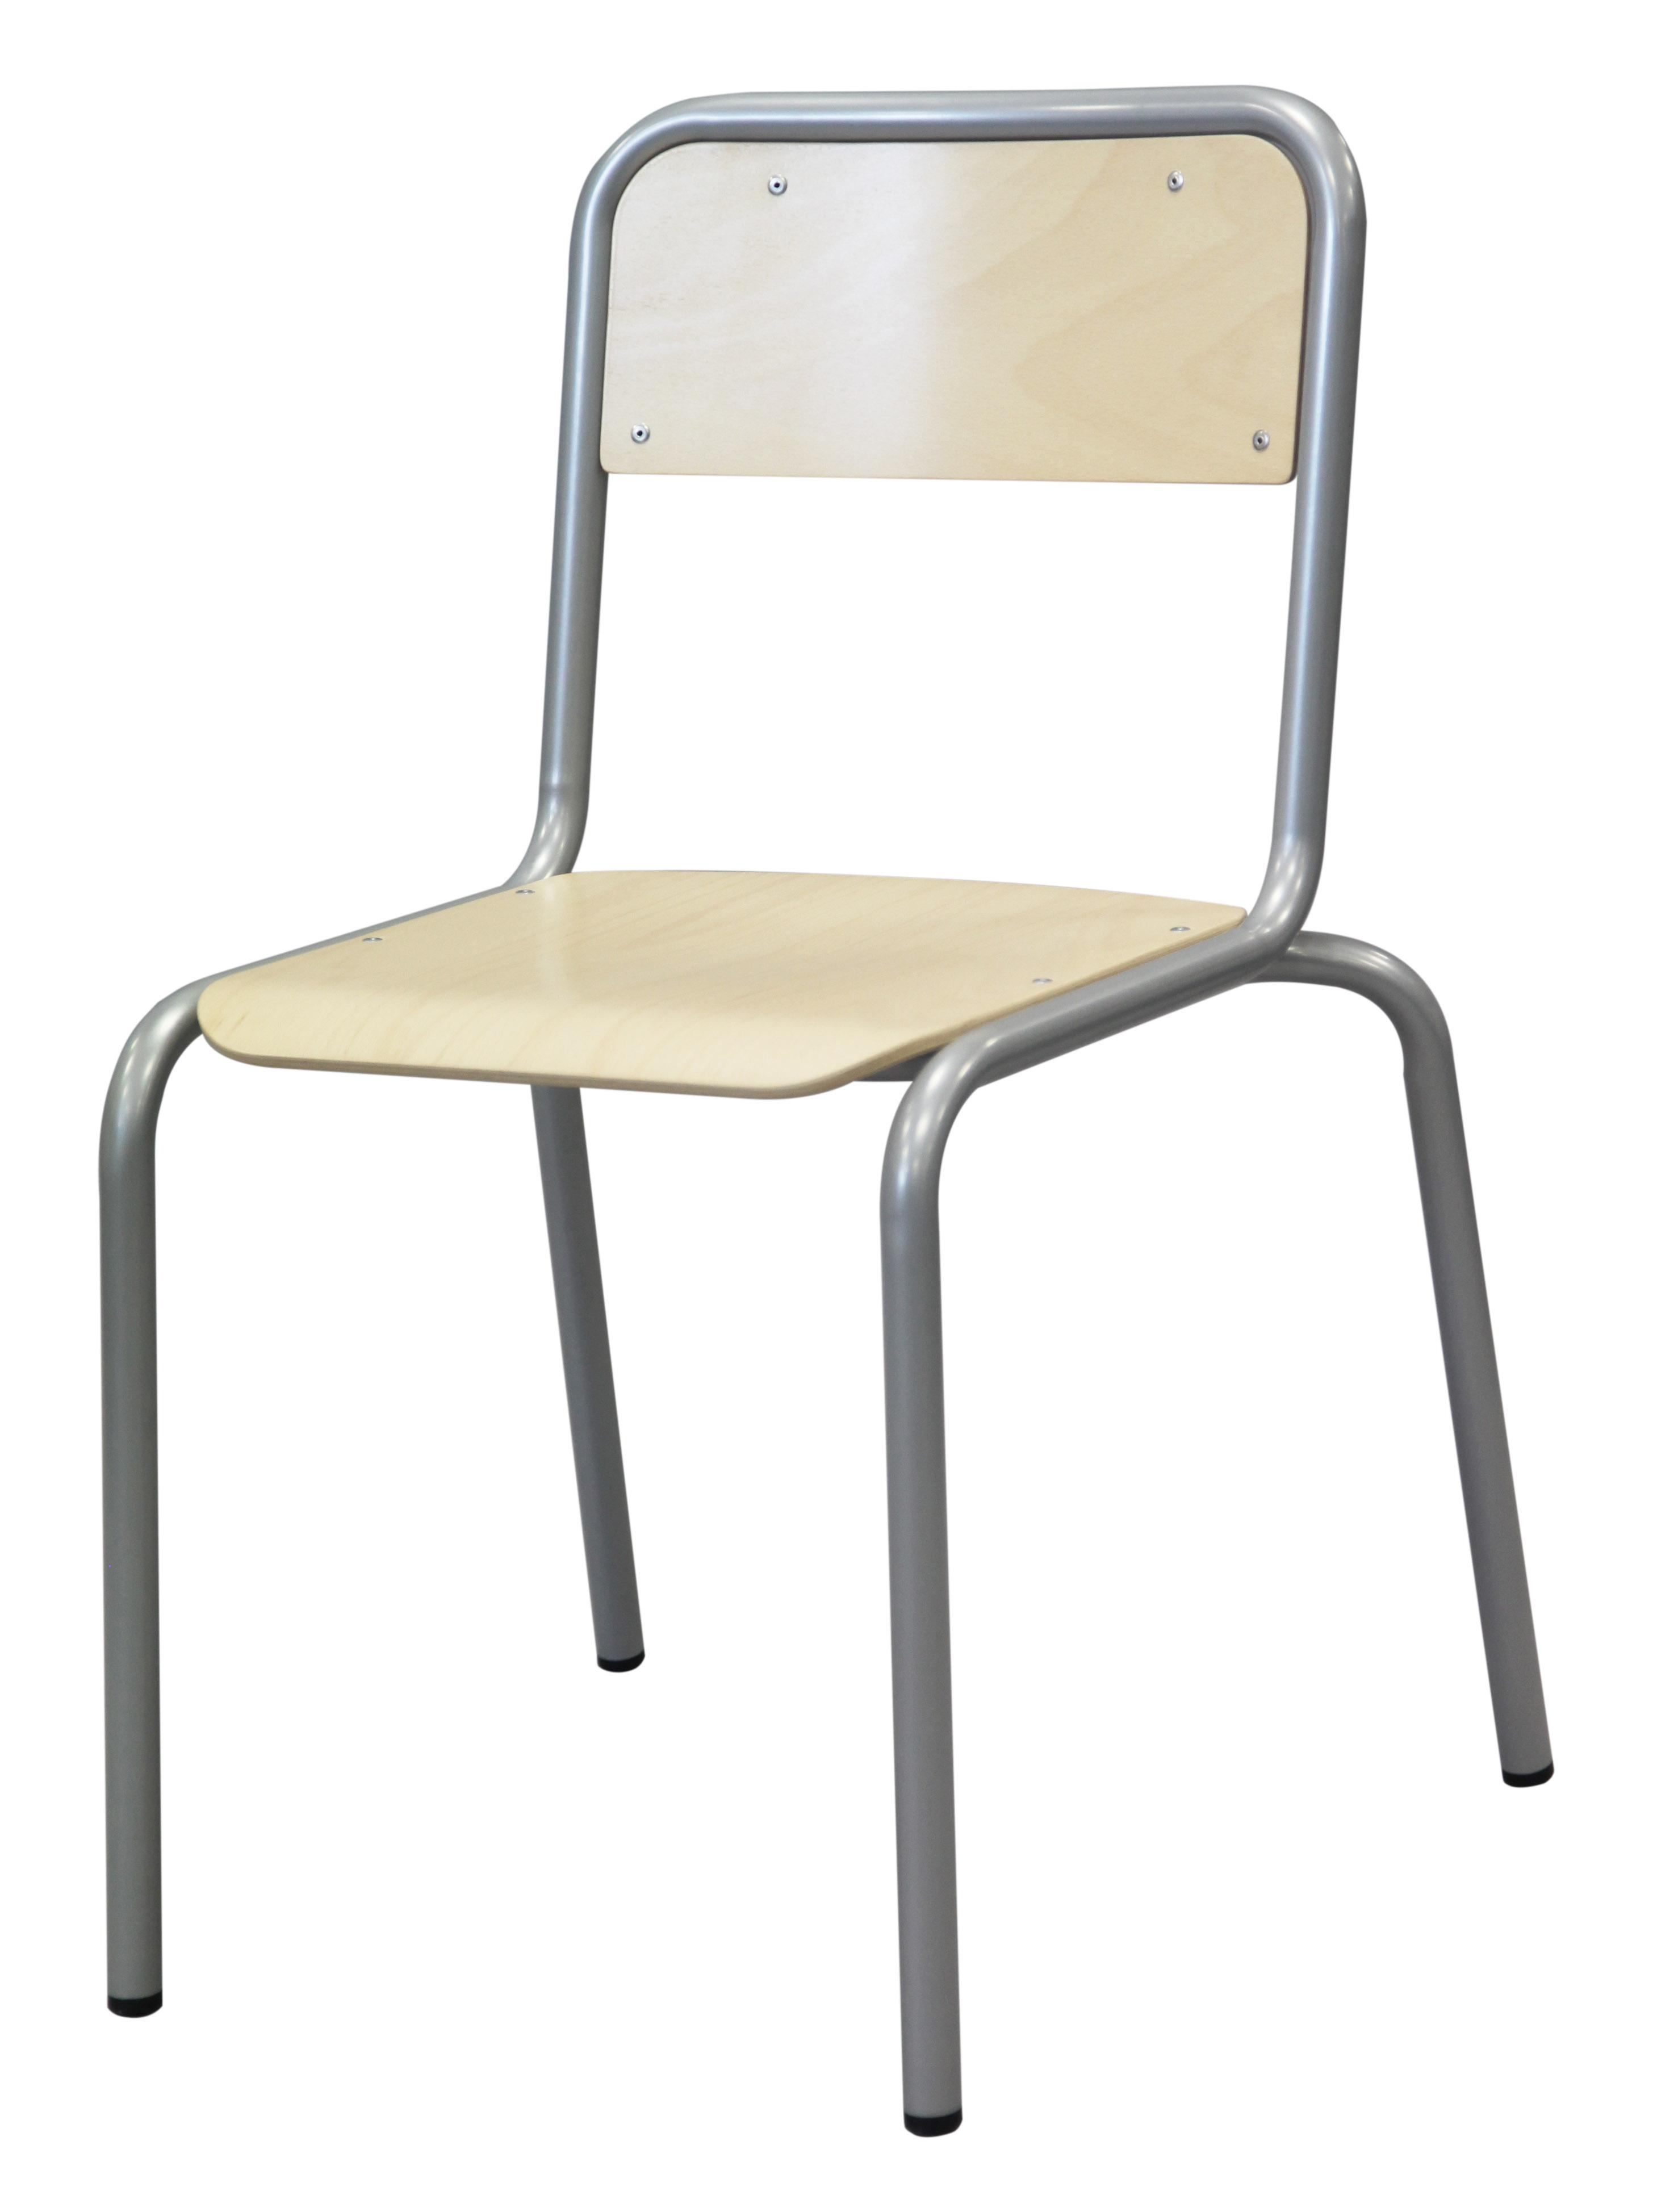 Chaise ALGO - 4 pieds - assise et coque multiplis